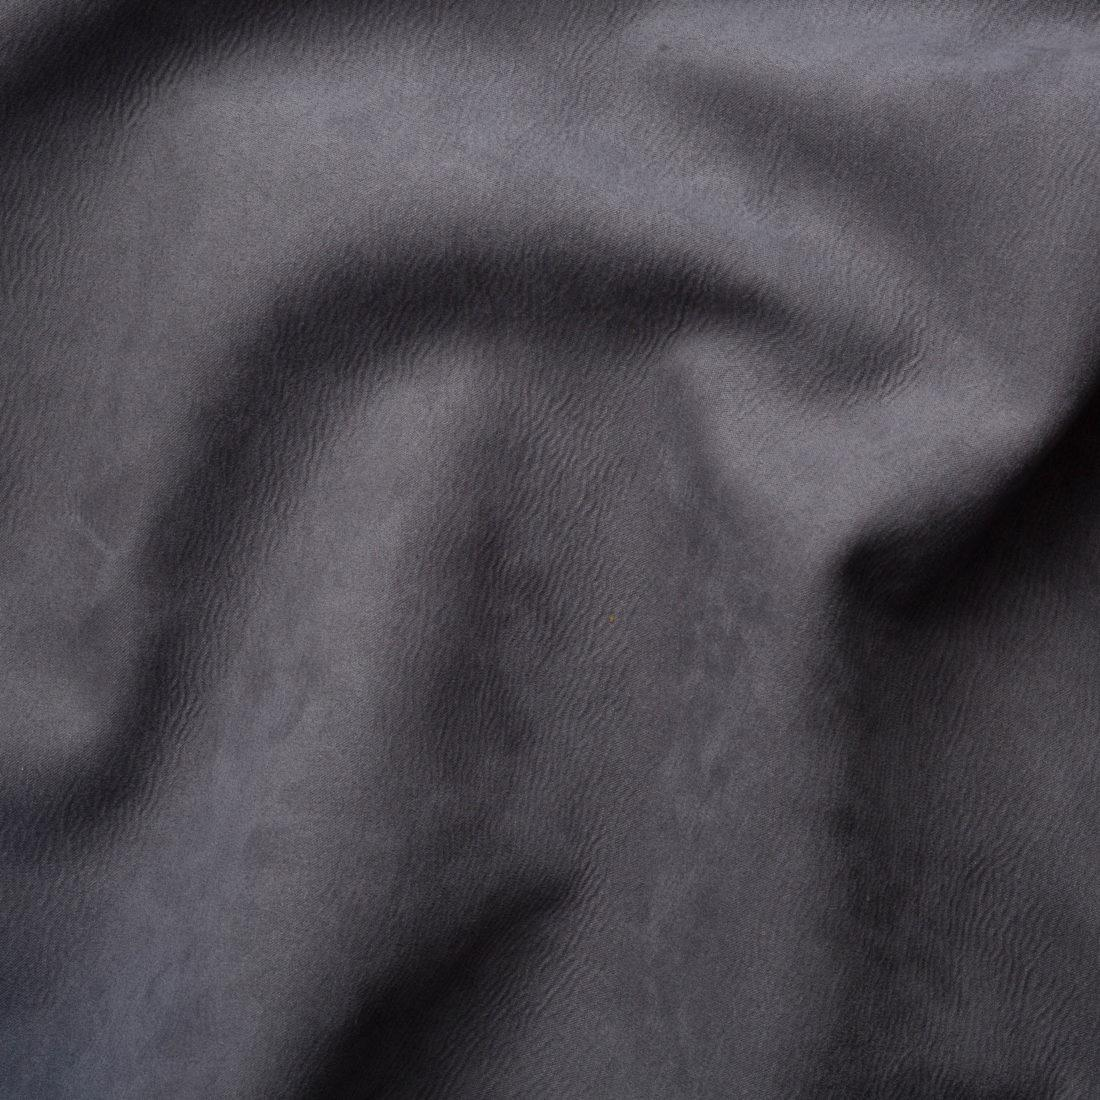 Меблева тканина Diva 113 Grey, штучна замша